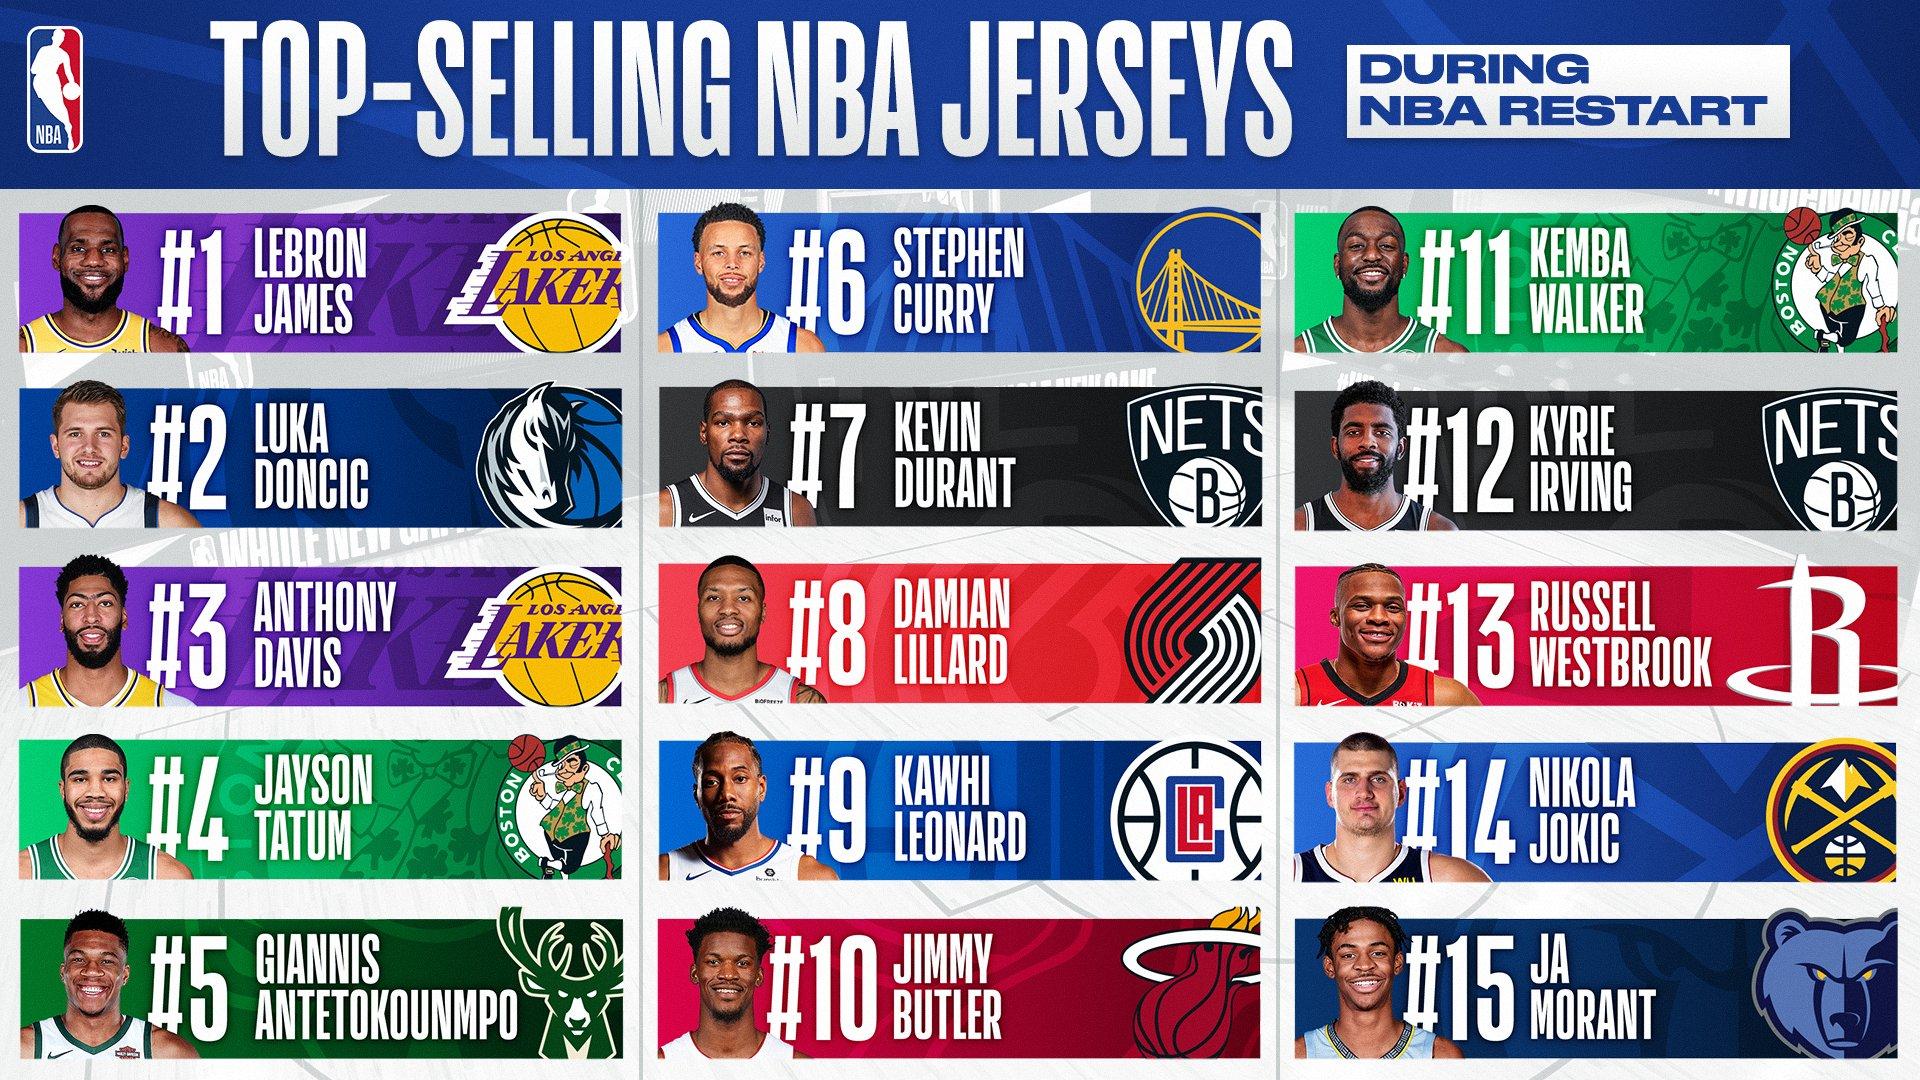 NBA Store on Twitter: